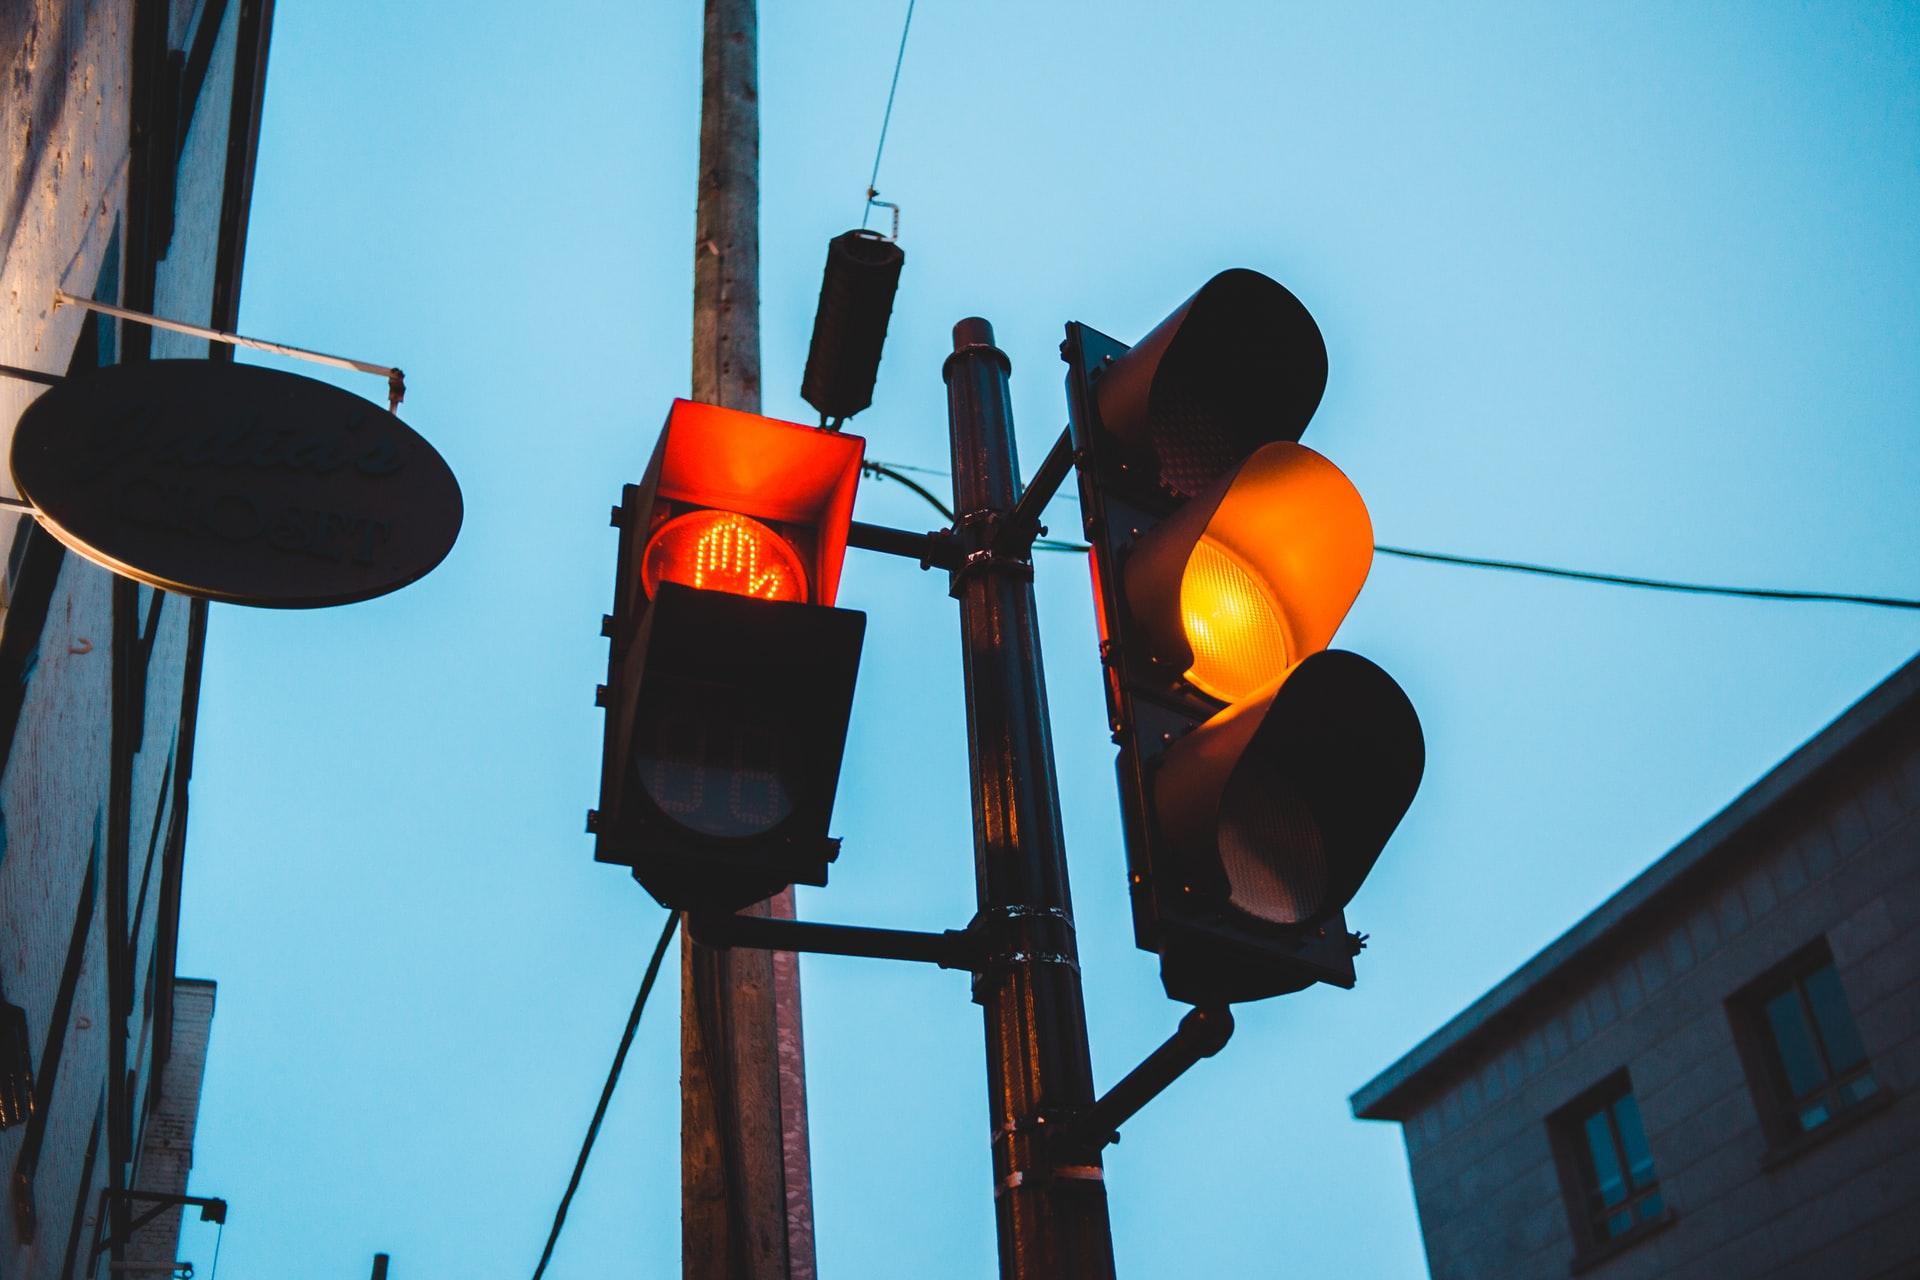 traffic-light-web-survey-progress-indicators